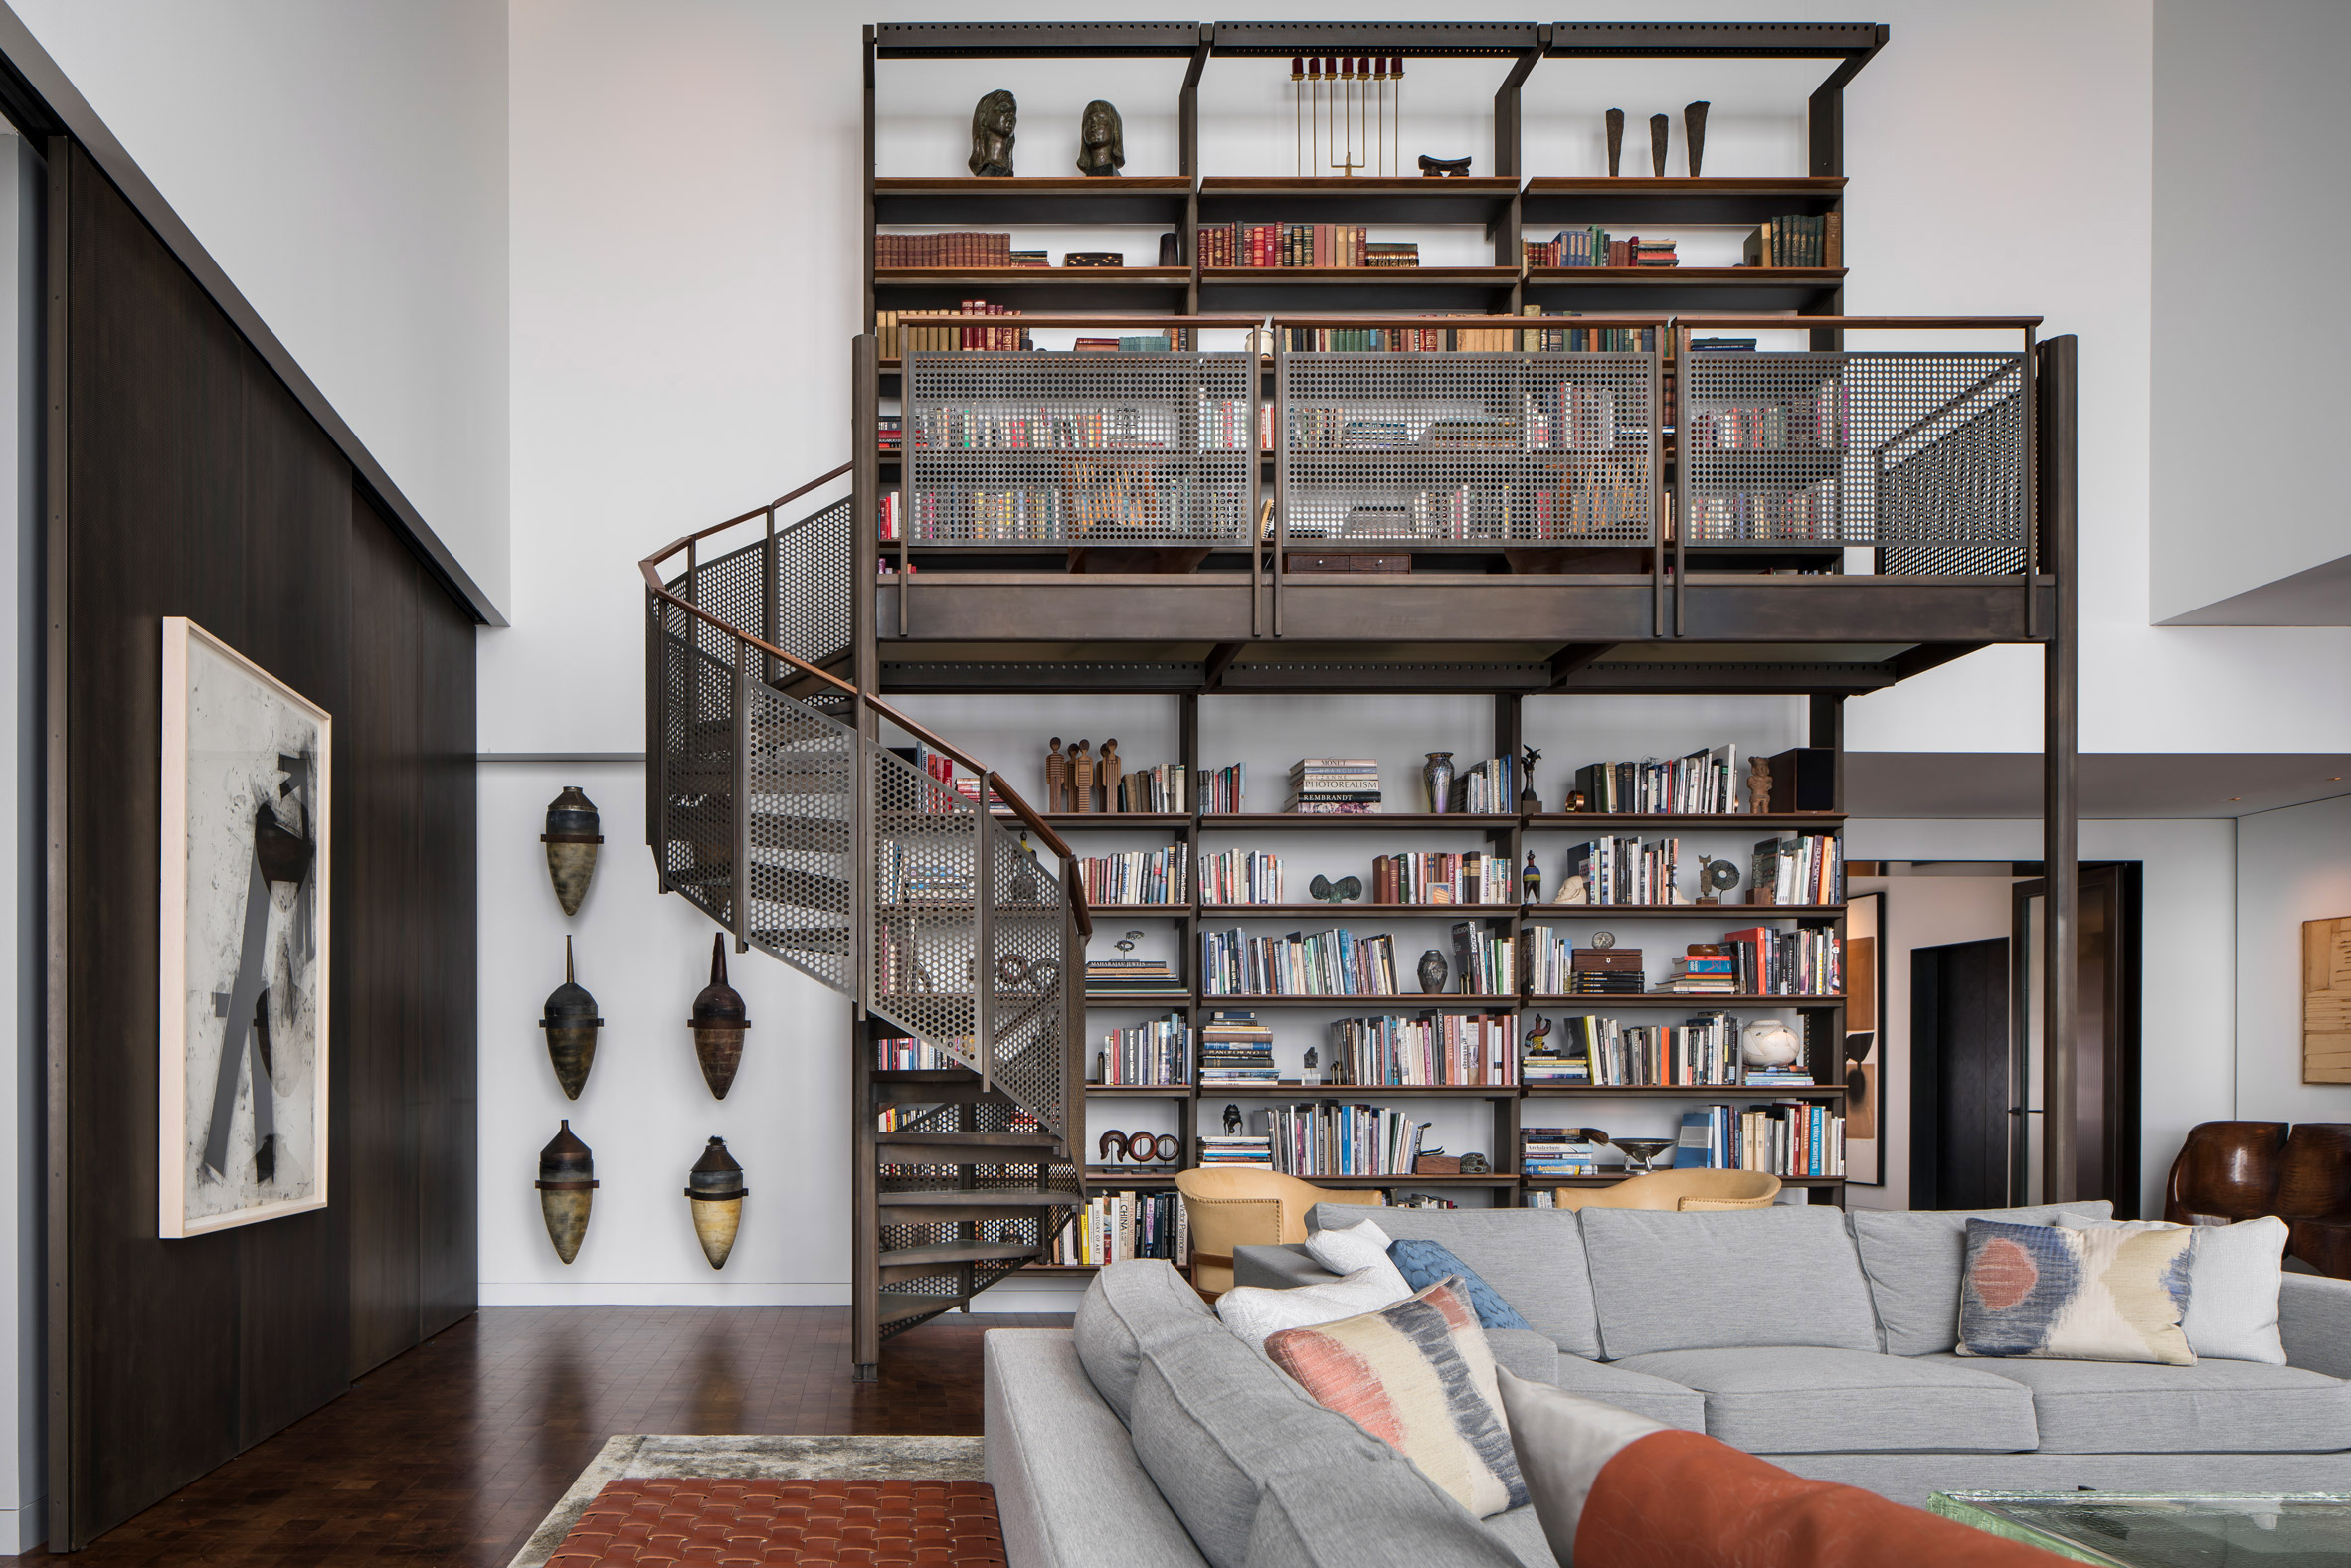 Bookcase mezzanine by Wheeler Kearns Architects